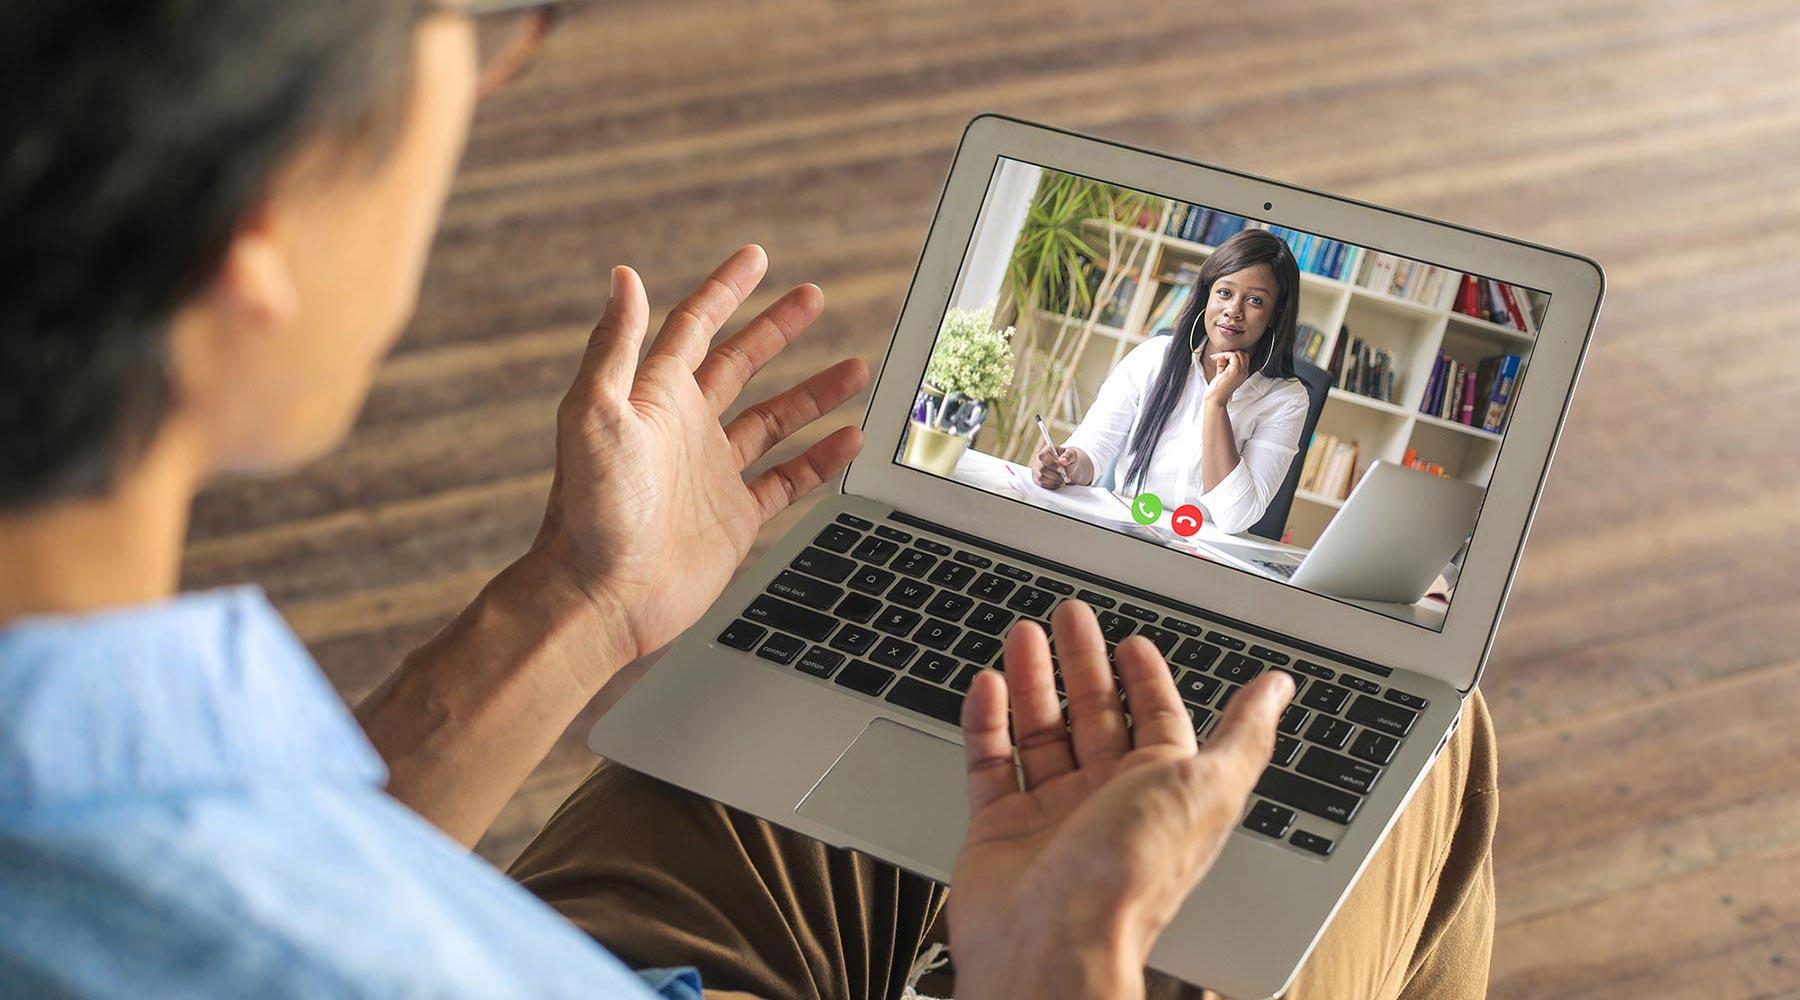 Helping Hesitant Patients Embrace Telehealth